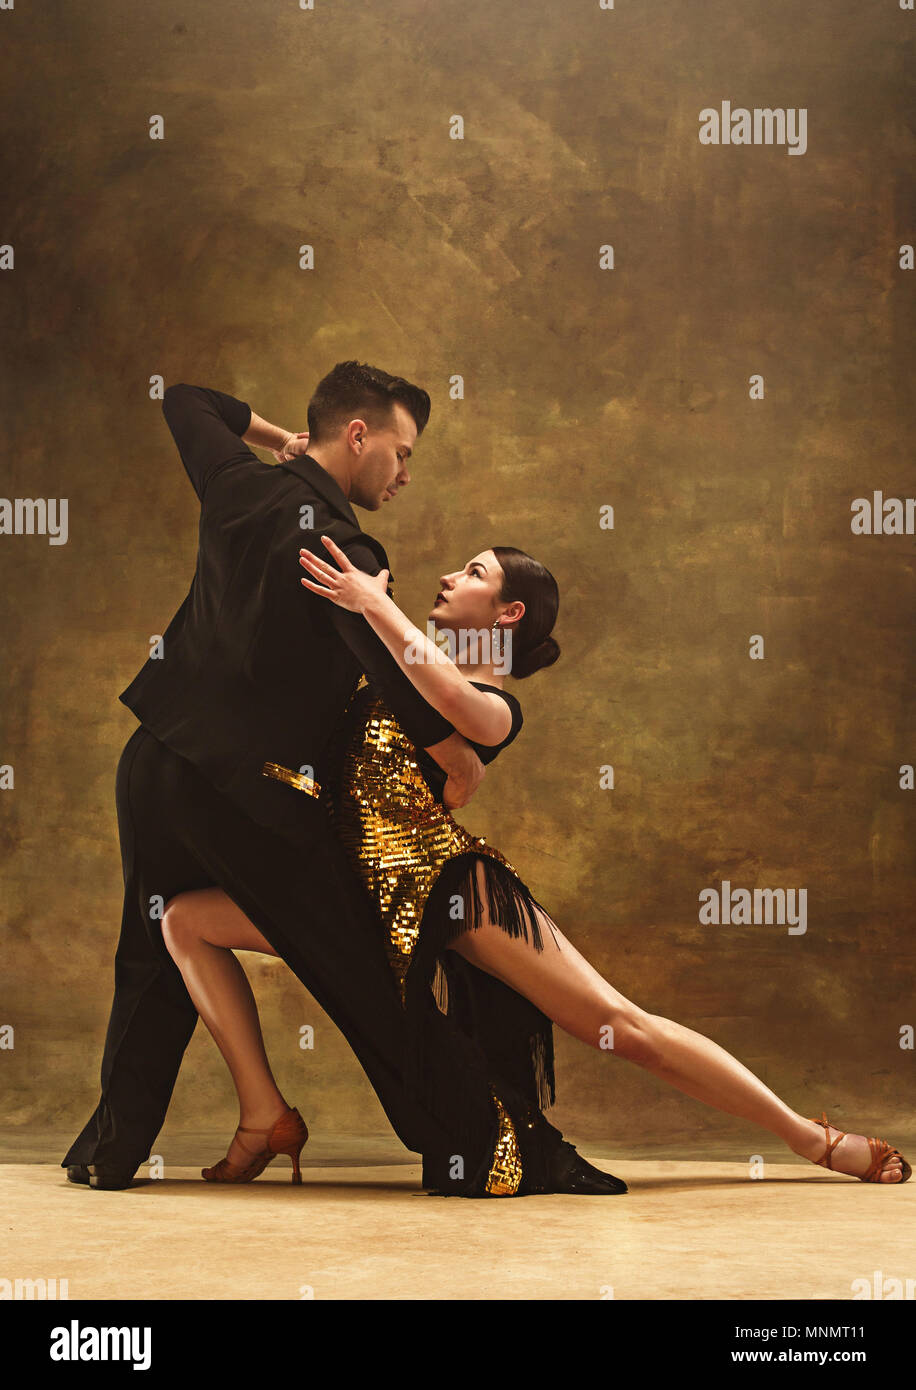 102942372 Dance ballroom couple in gold dress dancing on studio background ...